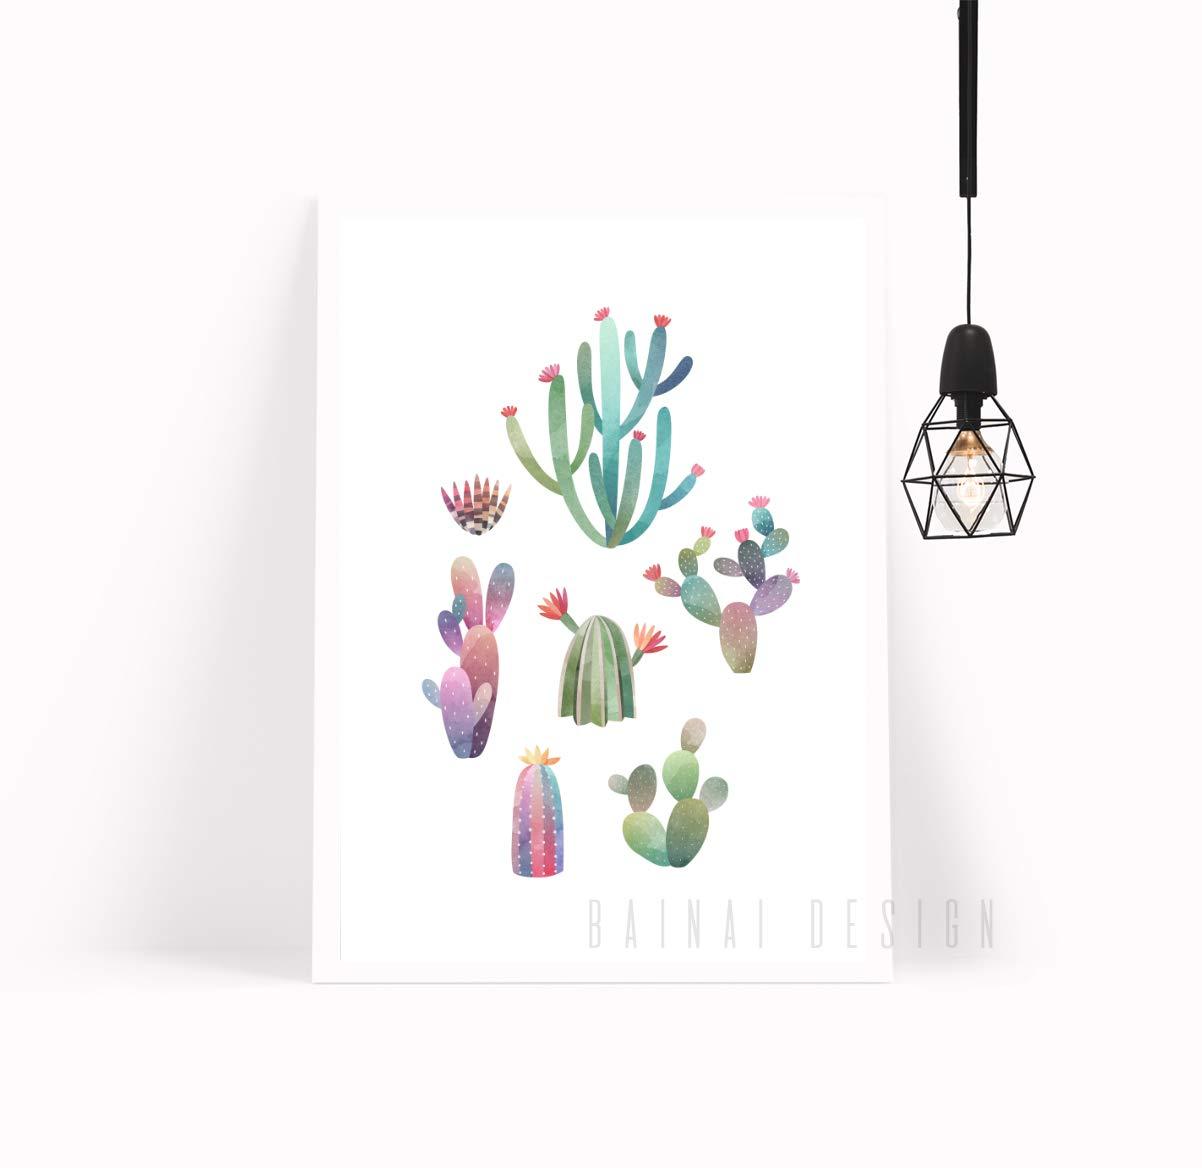 DIN A3 Kunstdruck Poster KAKTUS N/°3 -ungerahmt- Pflanze Kaktusbl/üte Wasserfarbe Natur